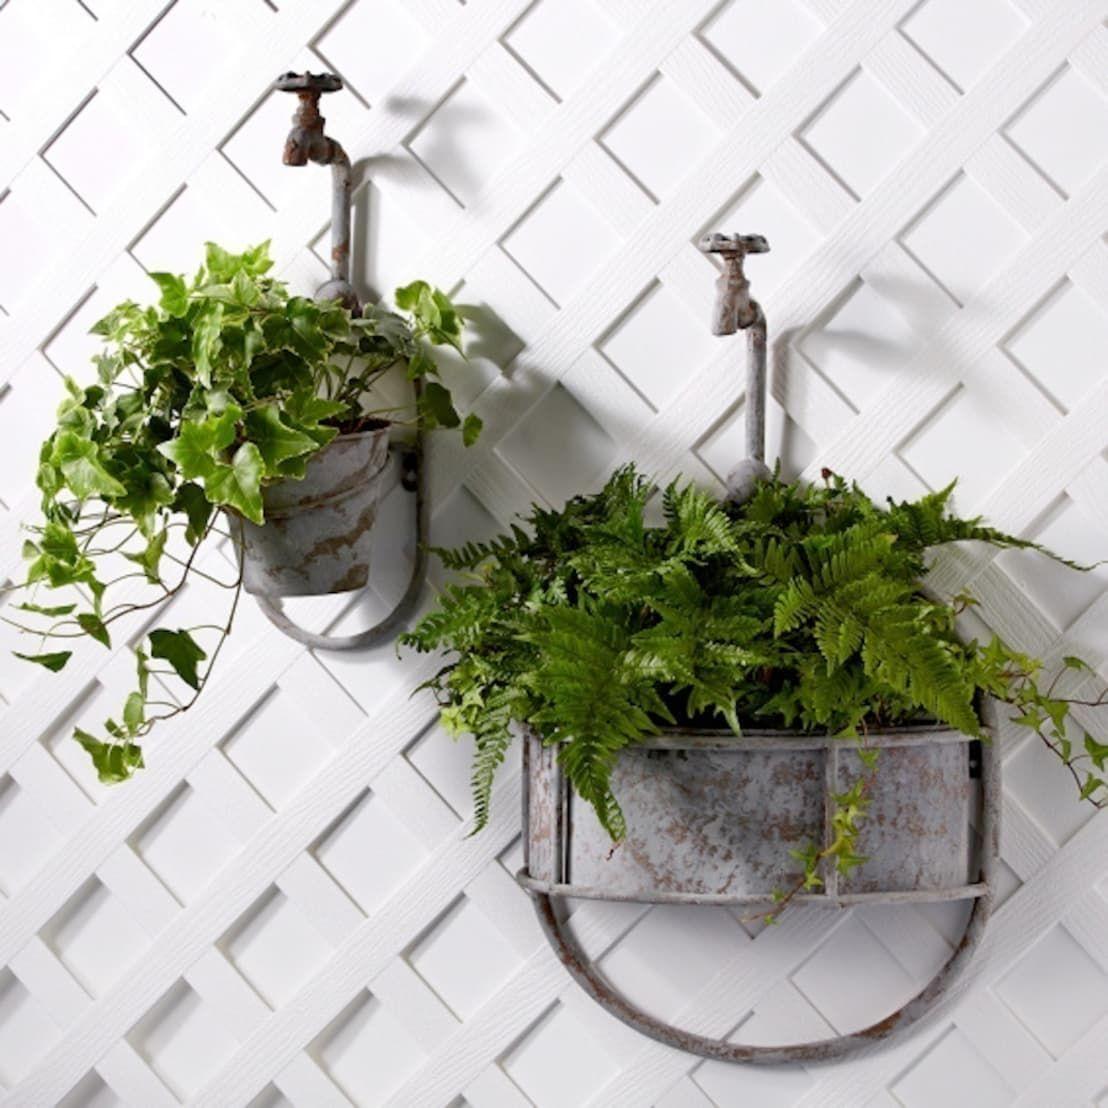 Hanging Vintage Garden Tap Planter | Home plants | Pinterest ...